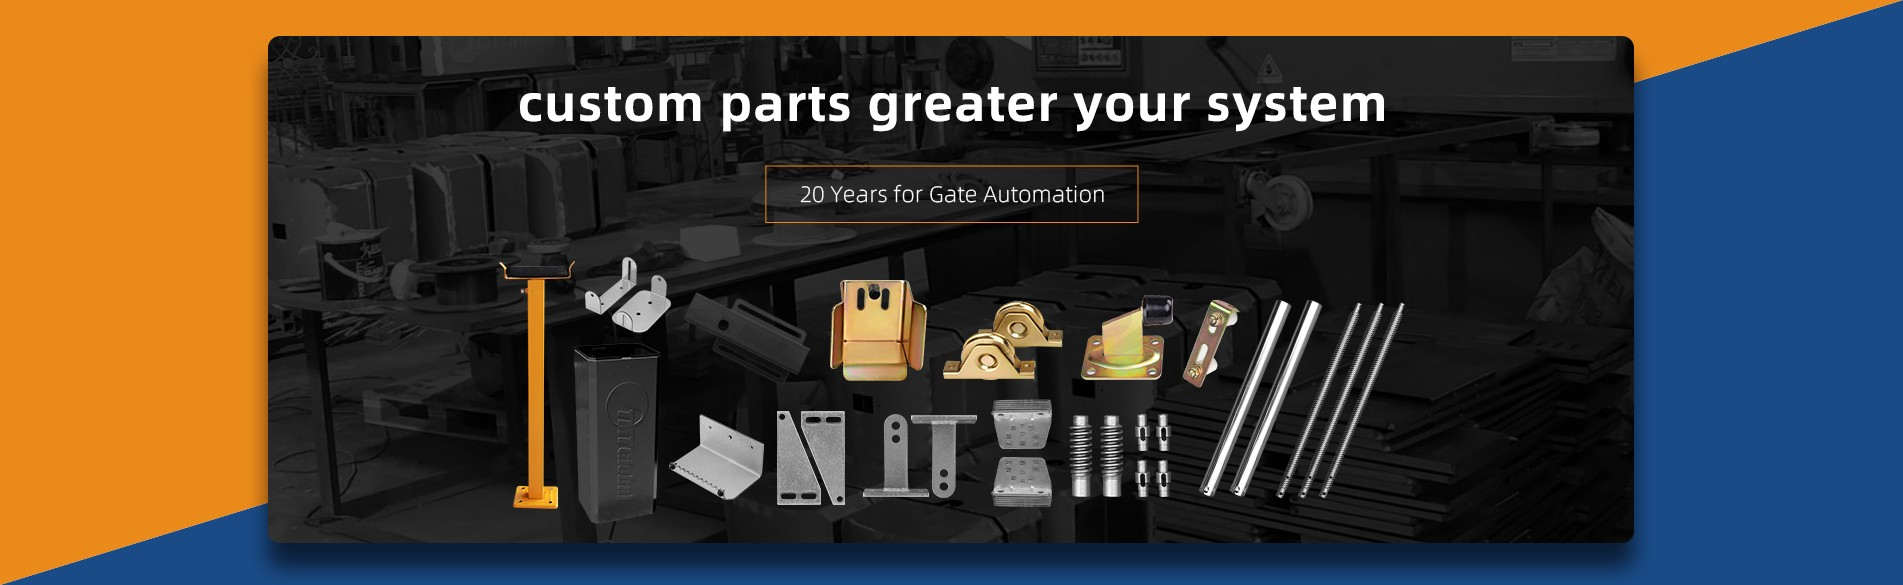 produktion custom hardware